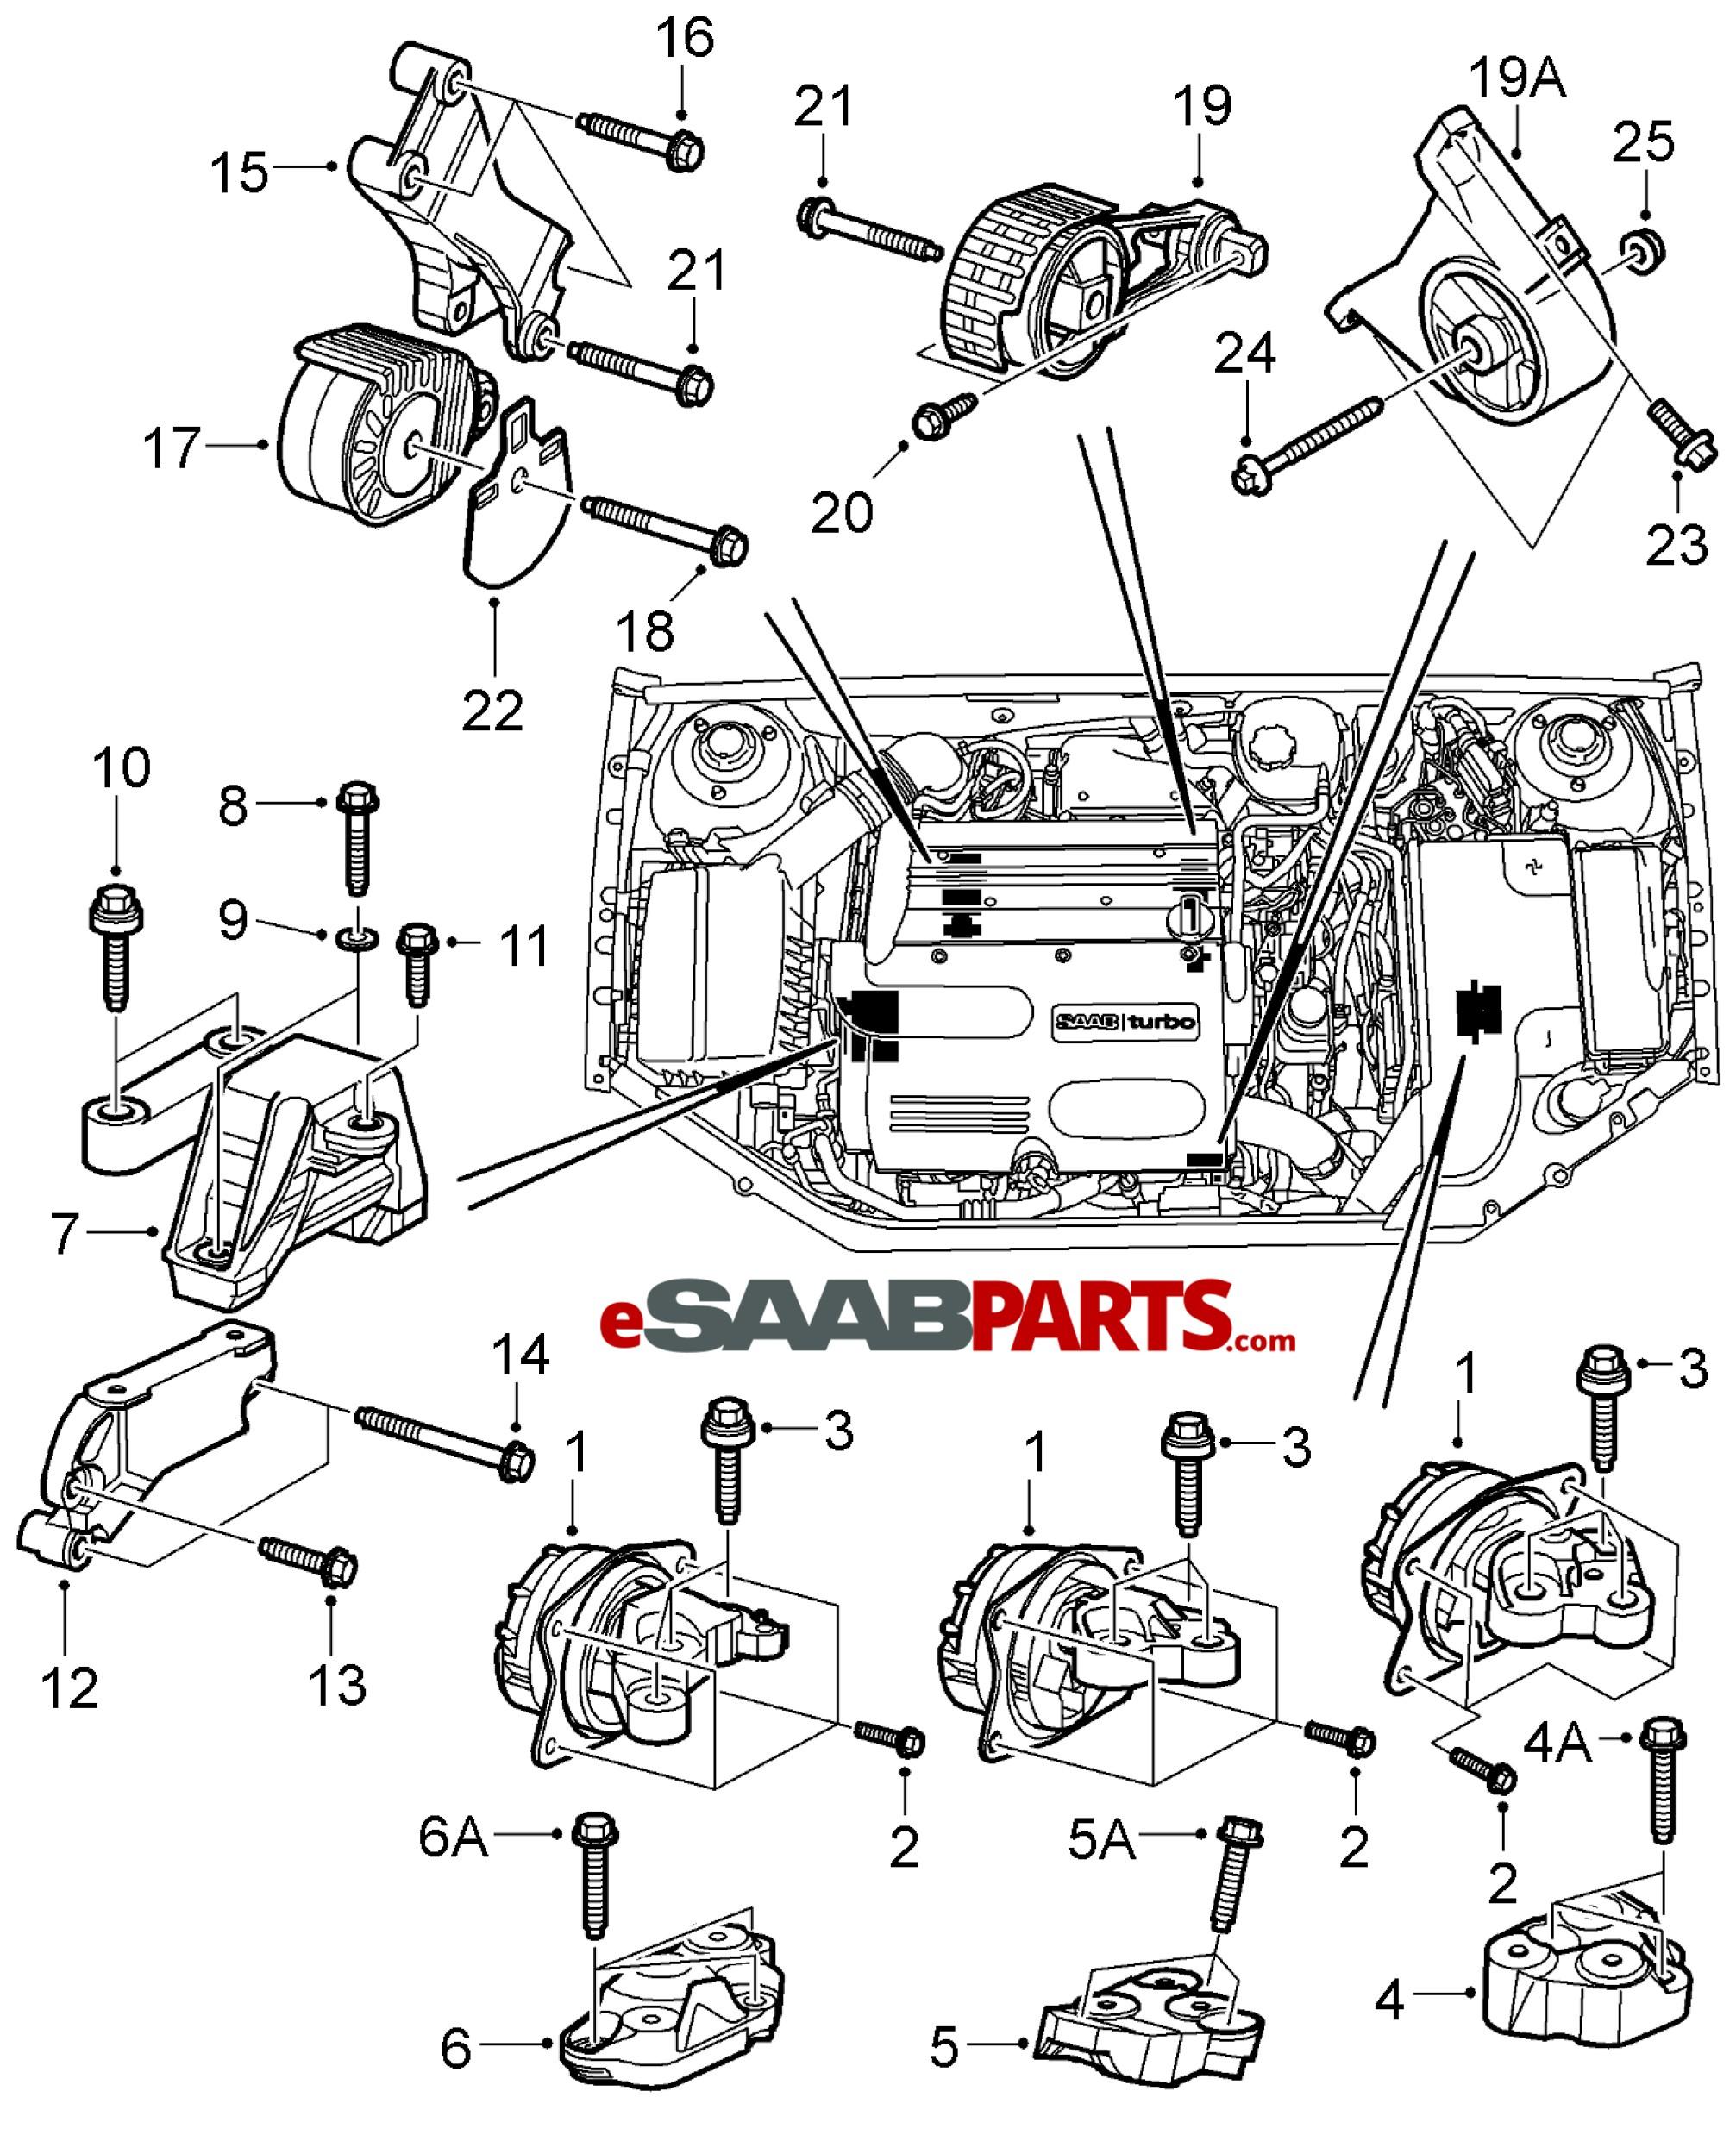 Turbo Engine Diagram Saab Engine Bay Diagram Layout Wiring Diagrams • Of Turbo Engine Diagram